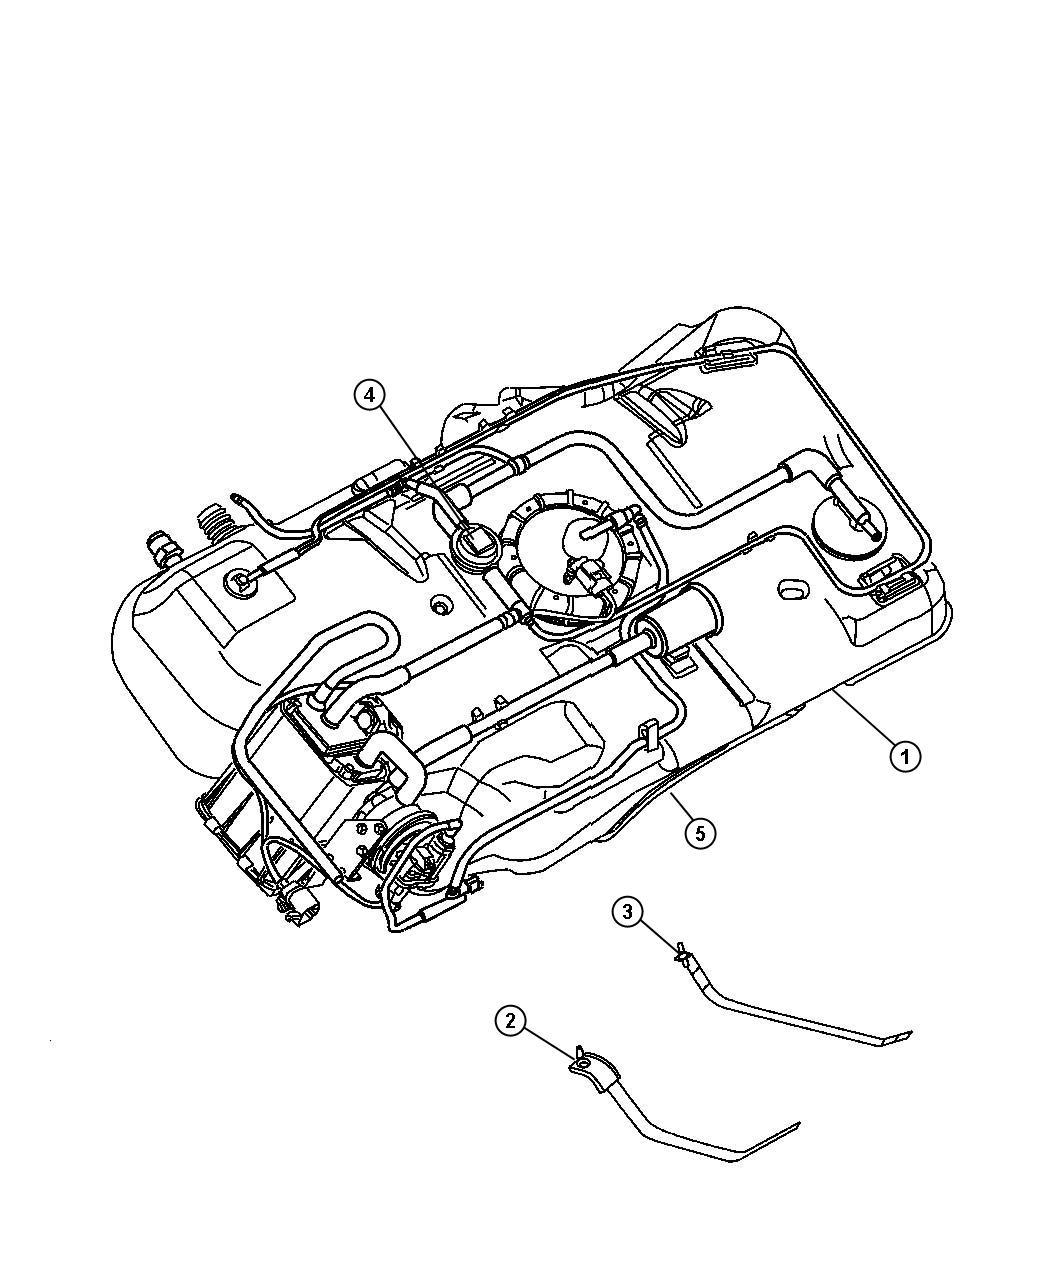 Chrysler Pt Cruiser Strap Right Fuel Tank Related